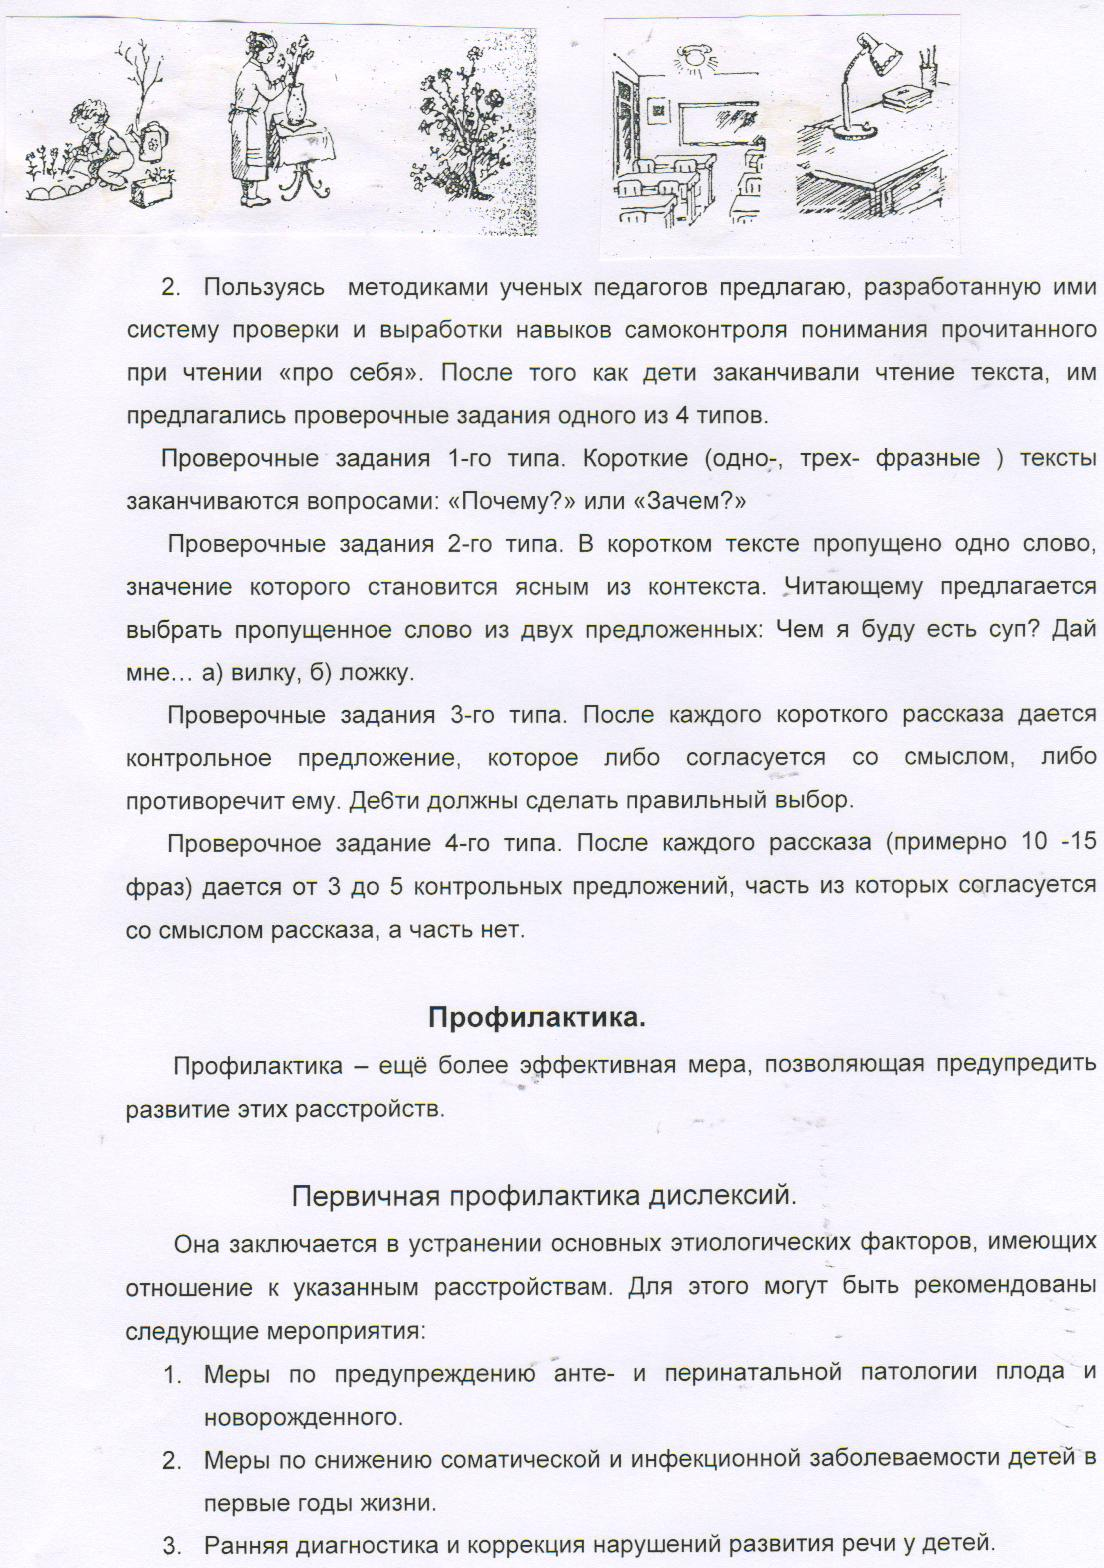 C:\Documents and Settings\Администратор\Рабочий стол\Тептякова Е.А. 011.jpg